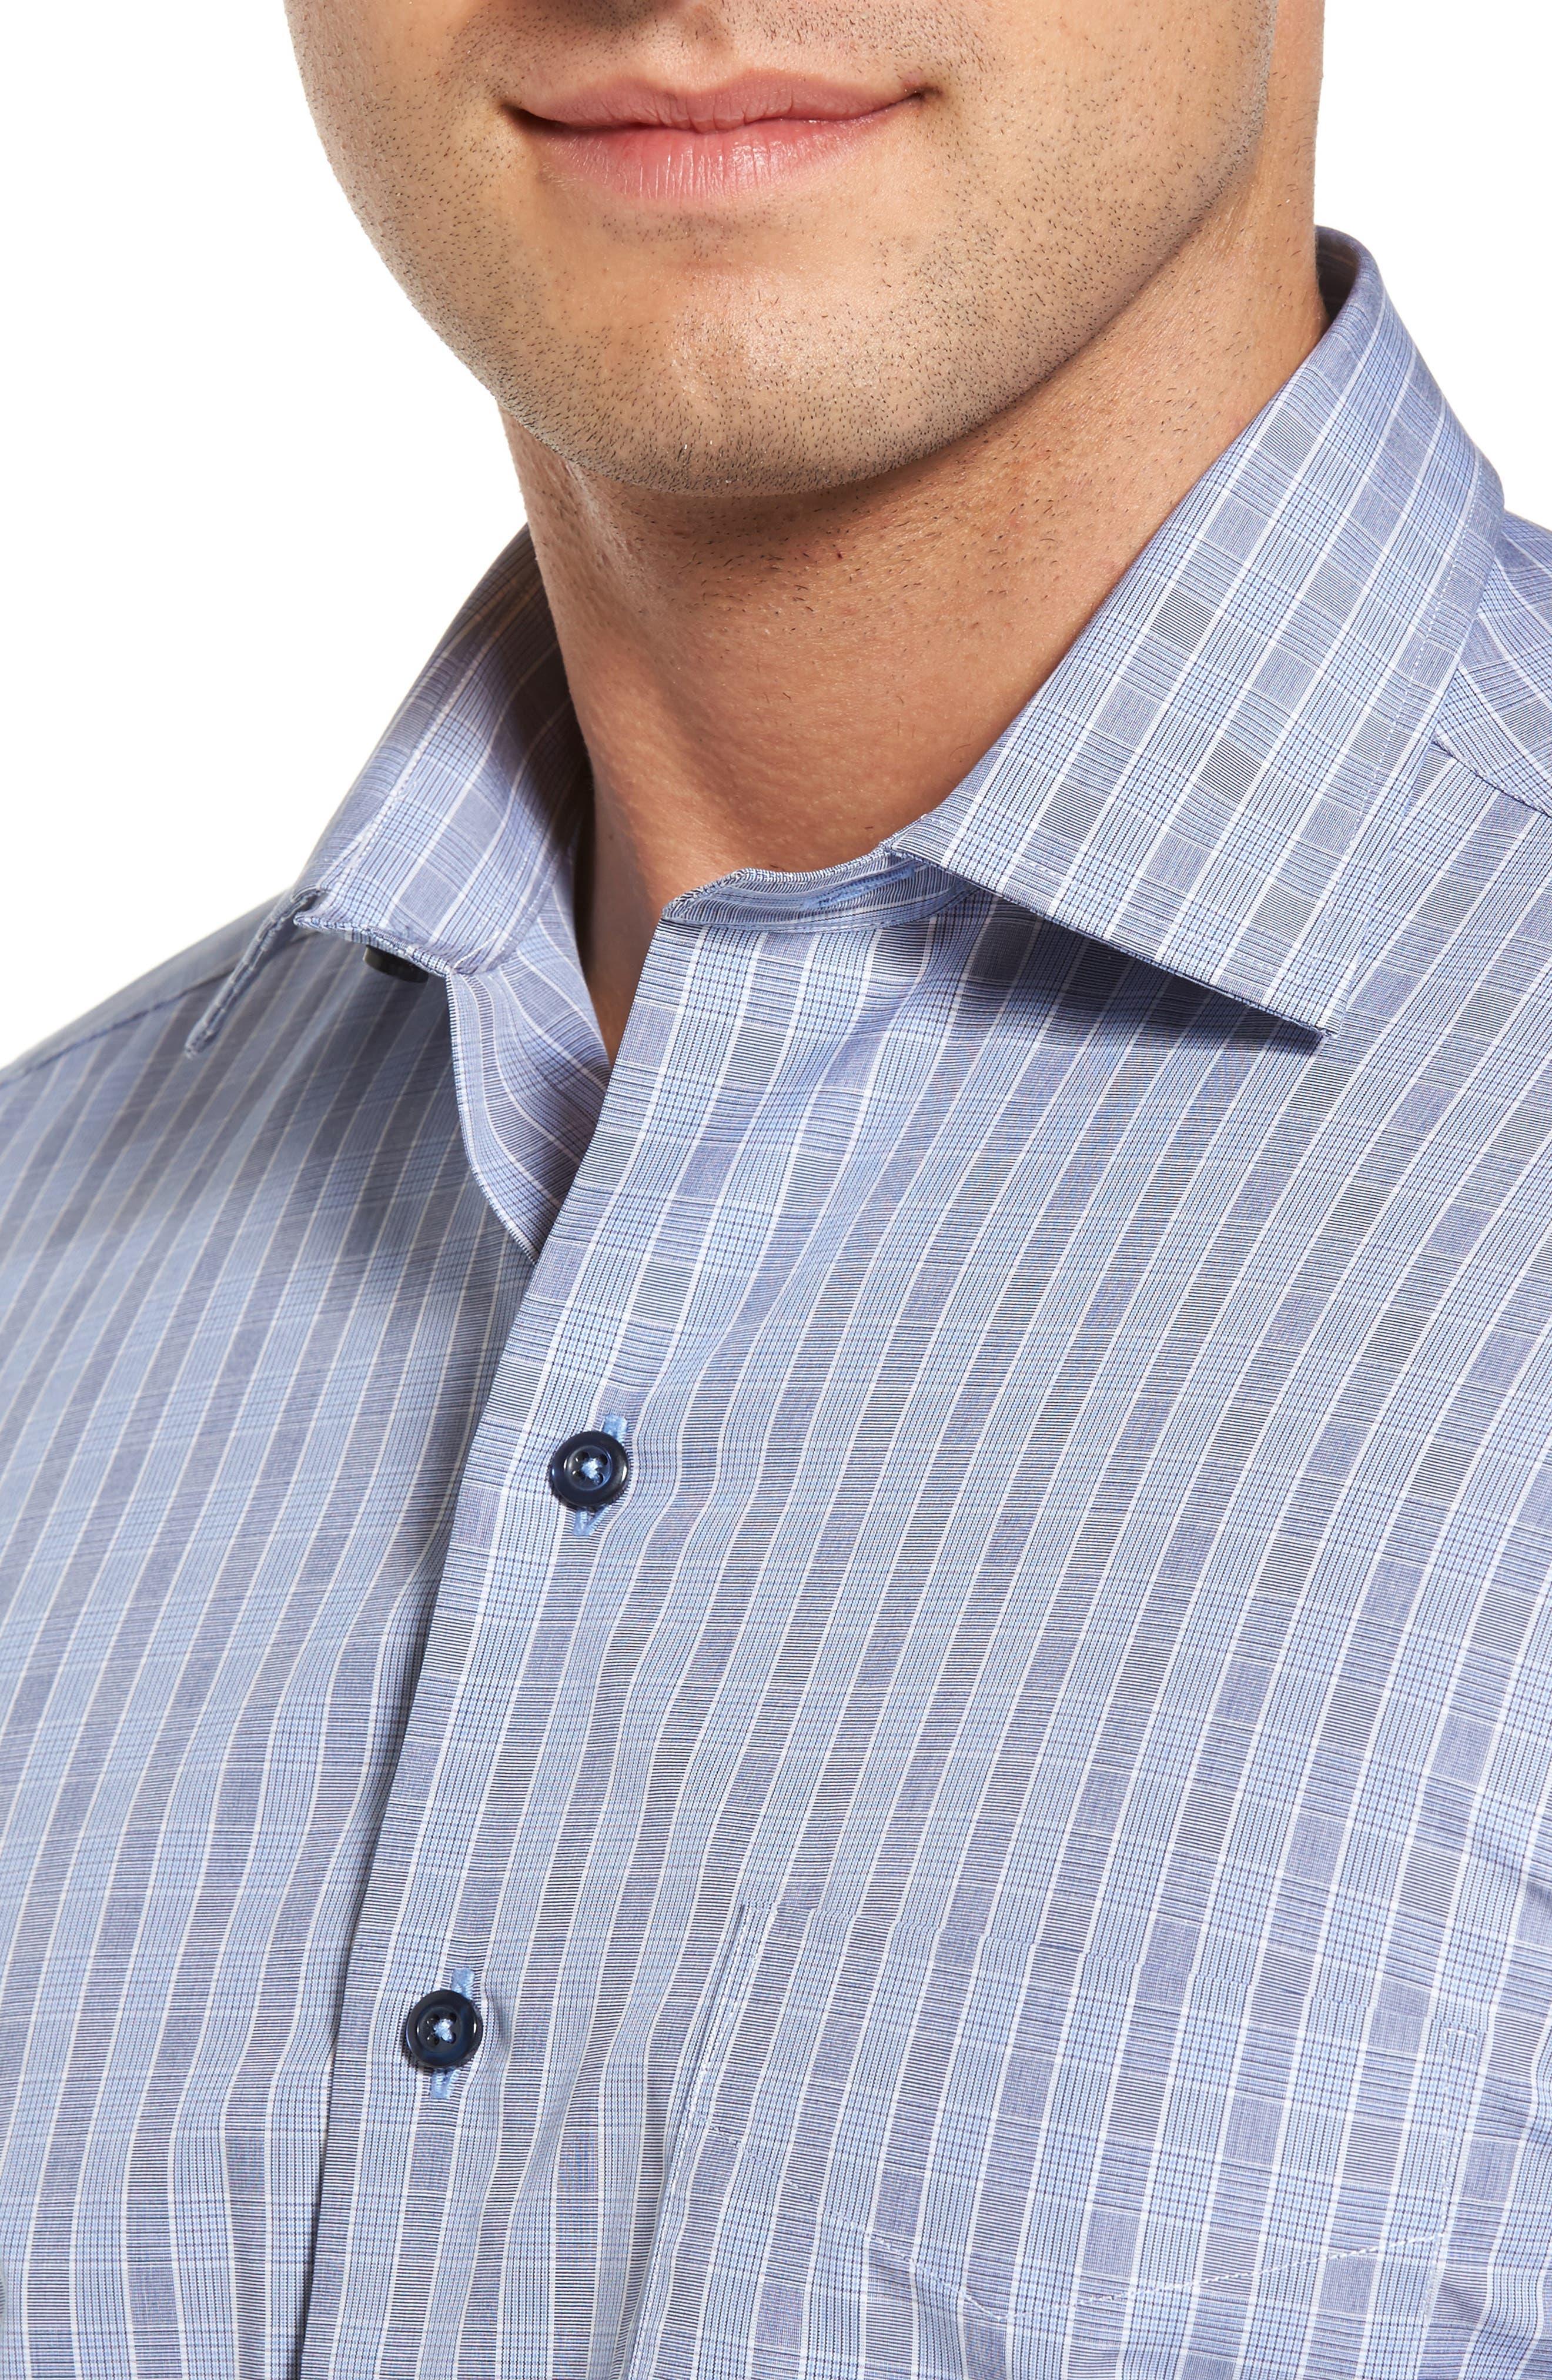 Regular Fit Plaid Sport Shirt,                             Alternate thumbnail 4, color,                             Navy/ Sky